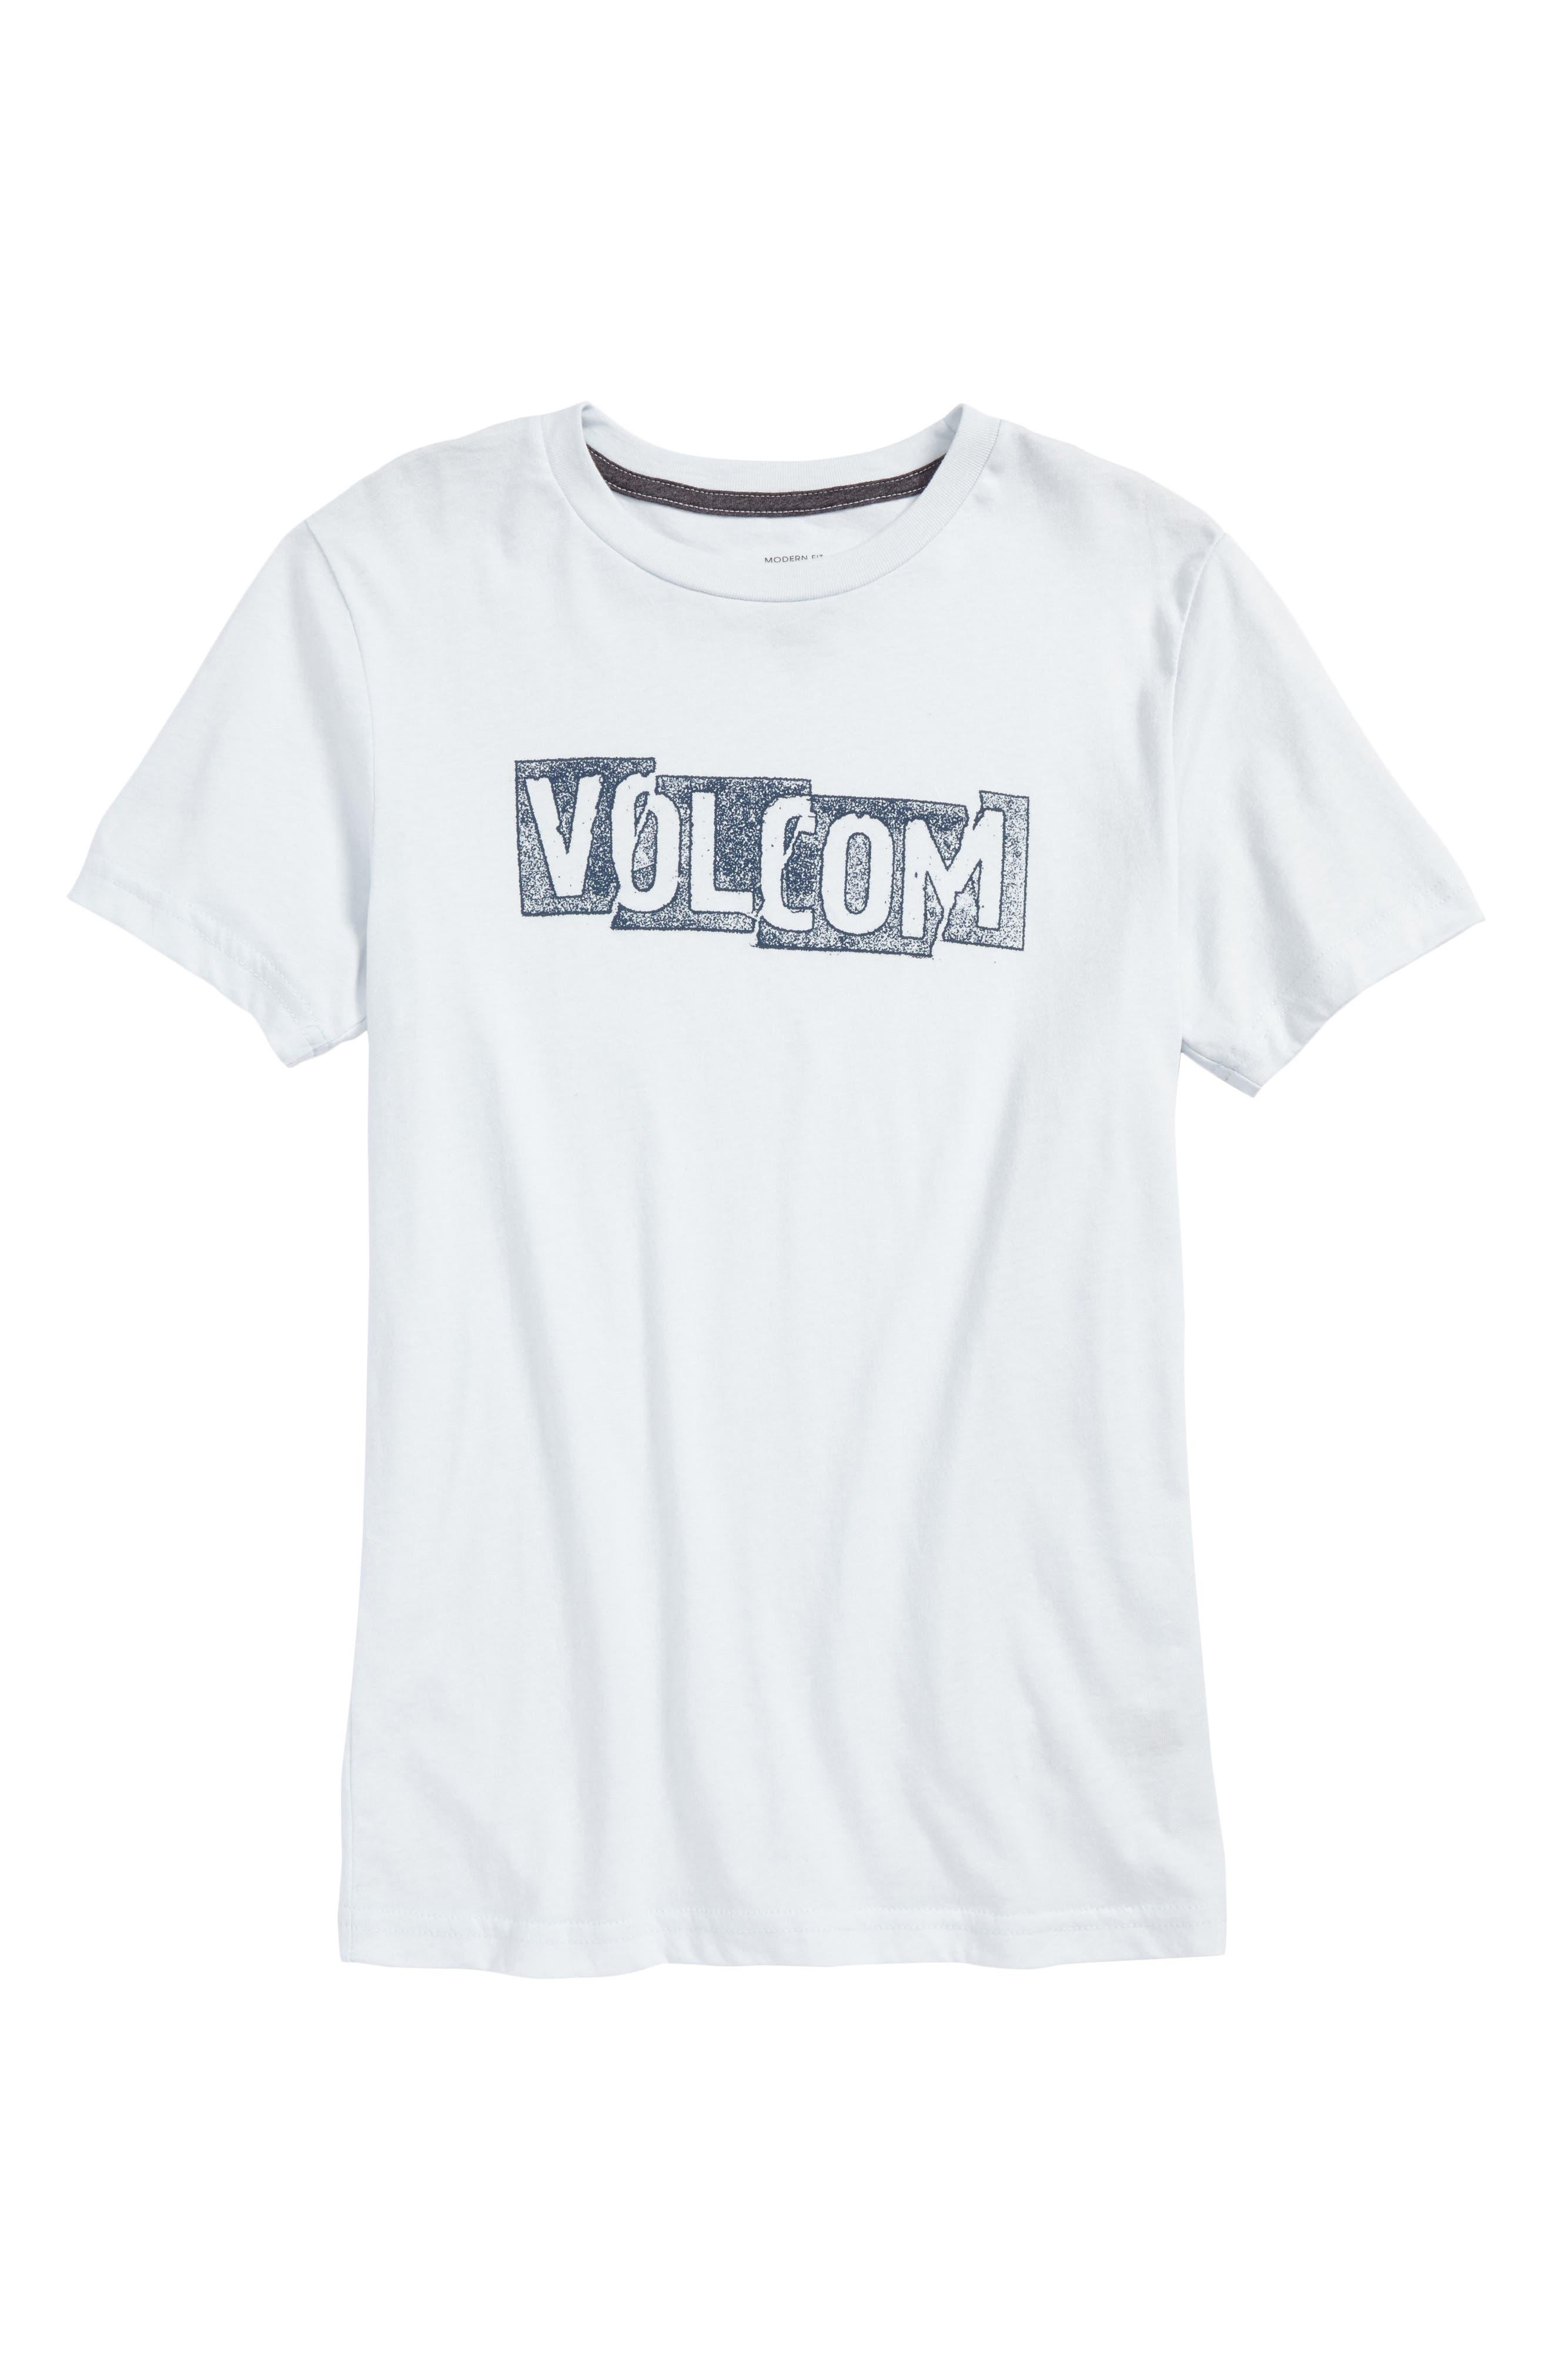 Alternate Image 1 Selected - Volcom Edge Logo Graphic T-Shirt (Big Boys)